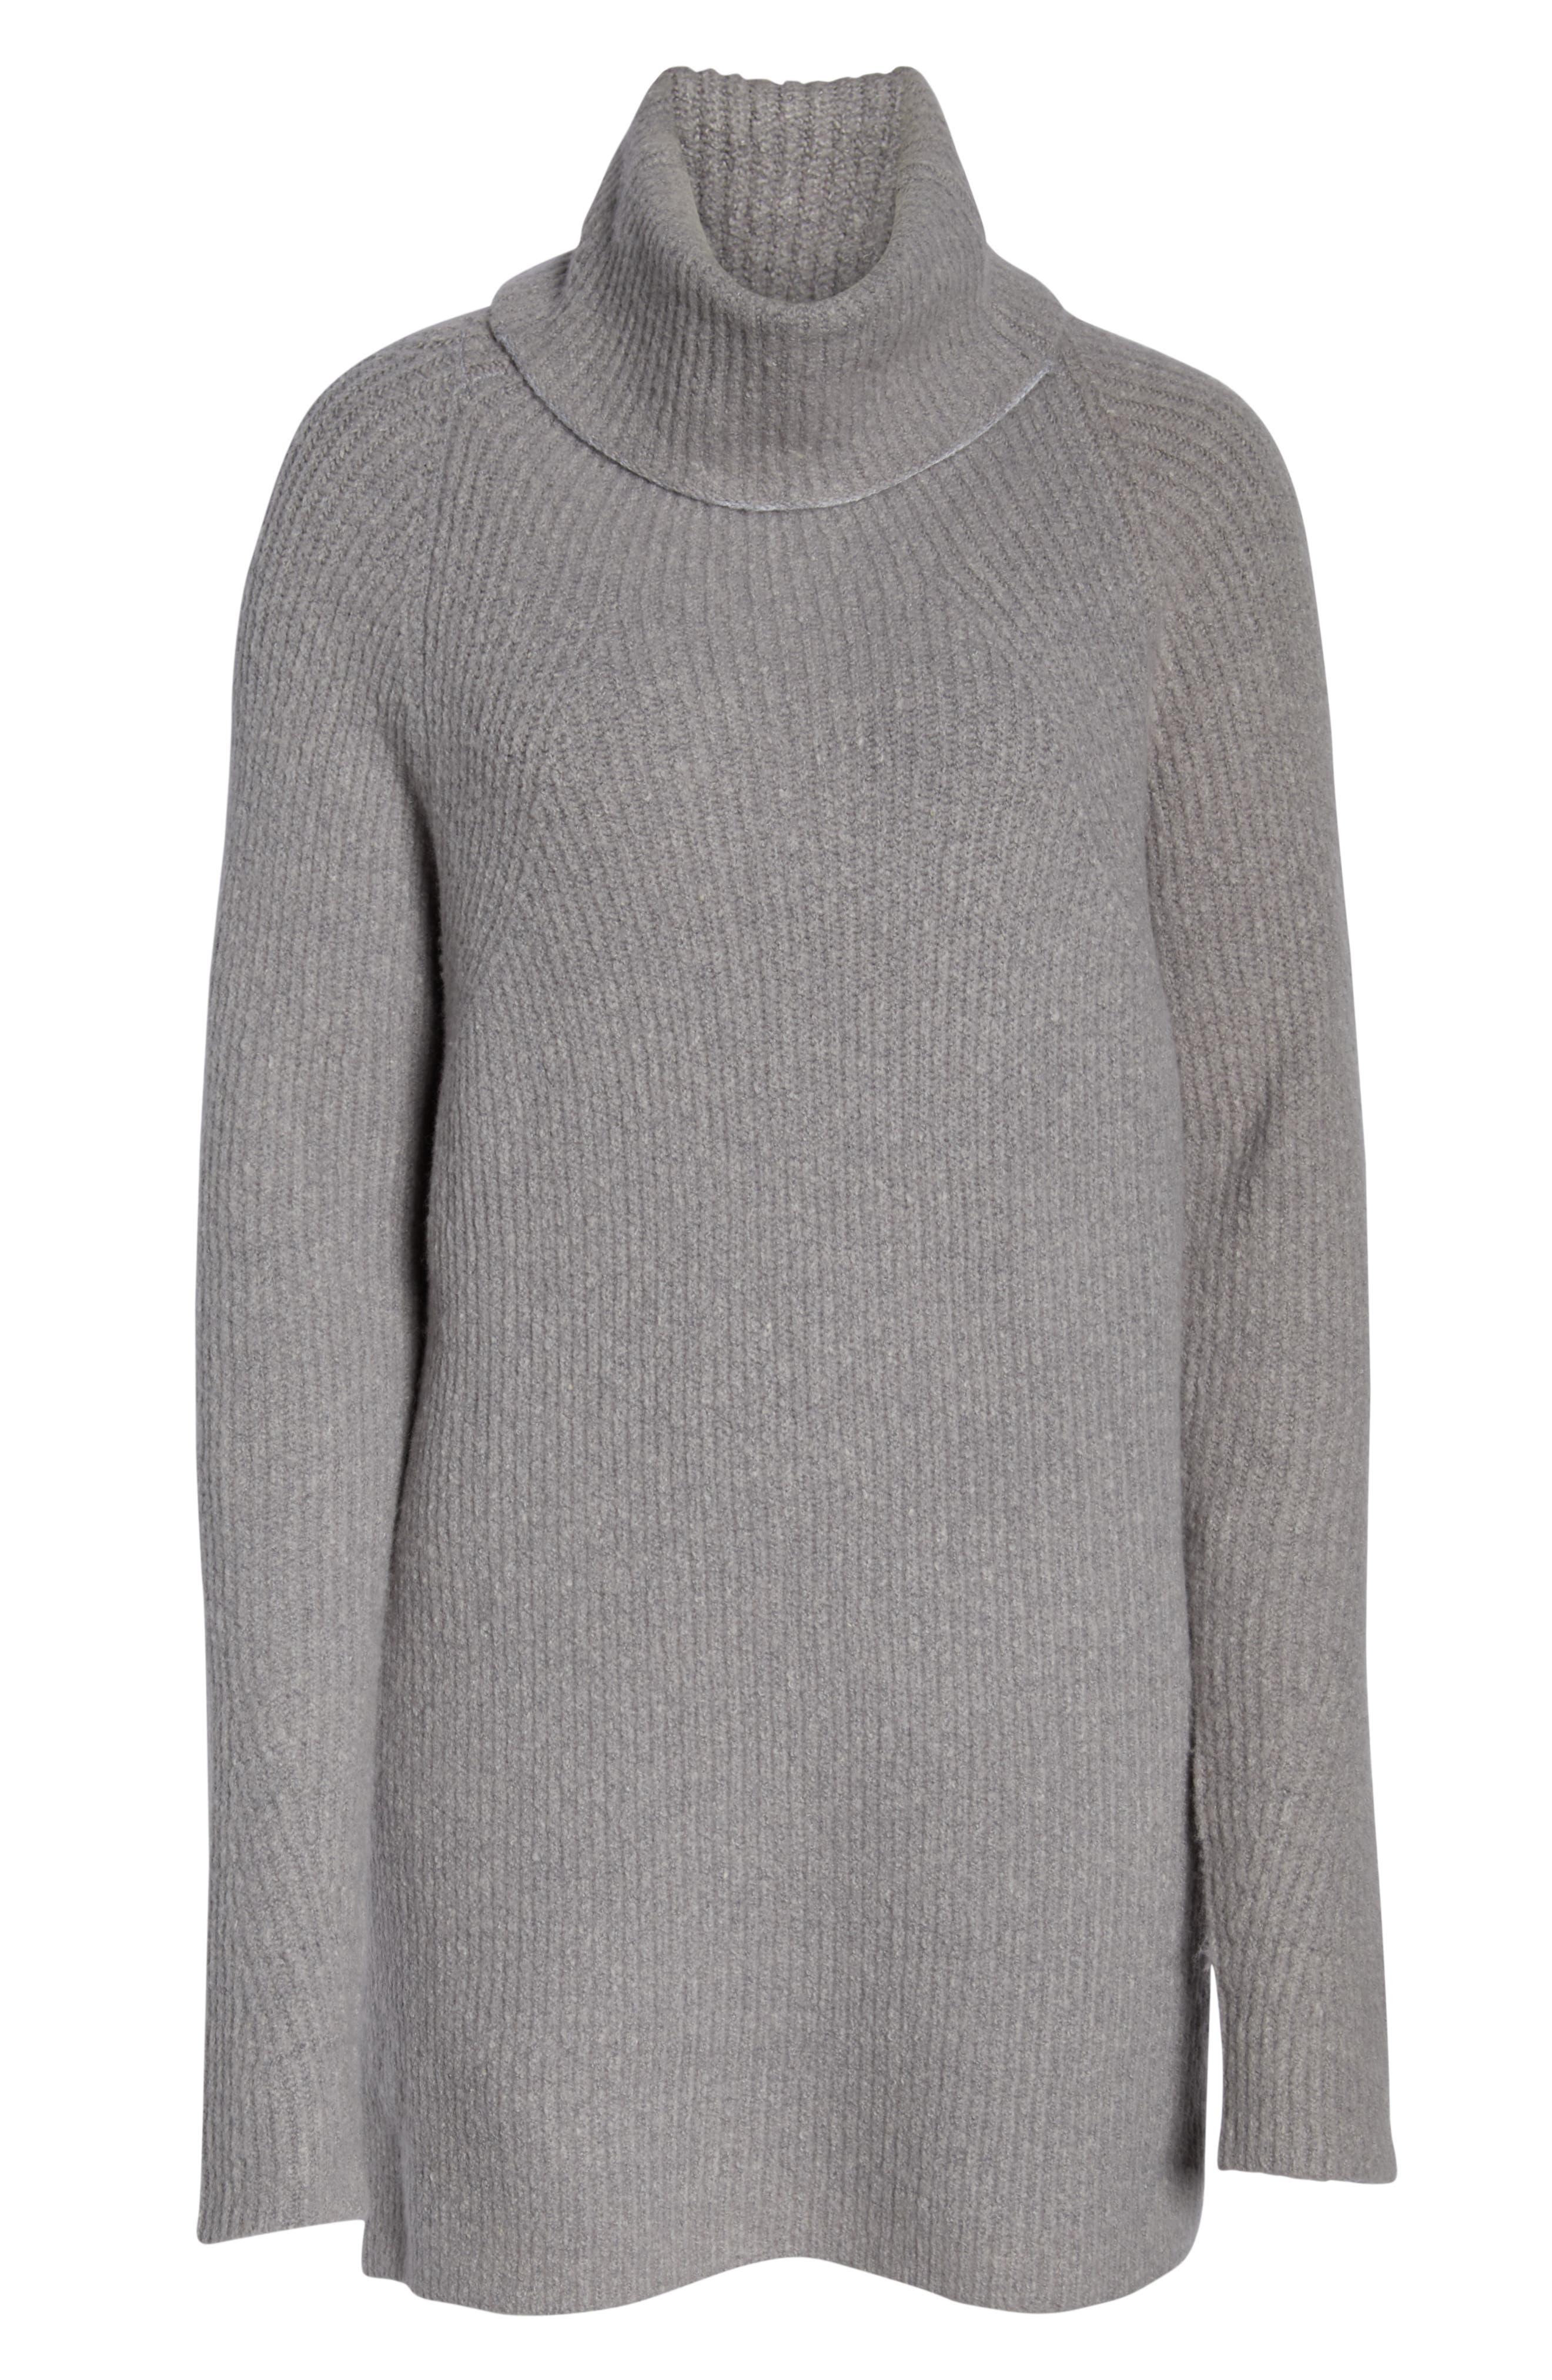 Shakti Oversize Sweater,                             Alternate thumbnail 7, color,                             SILVER GREY MARL